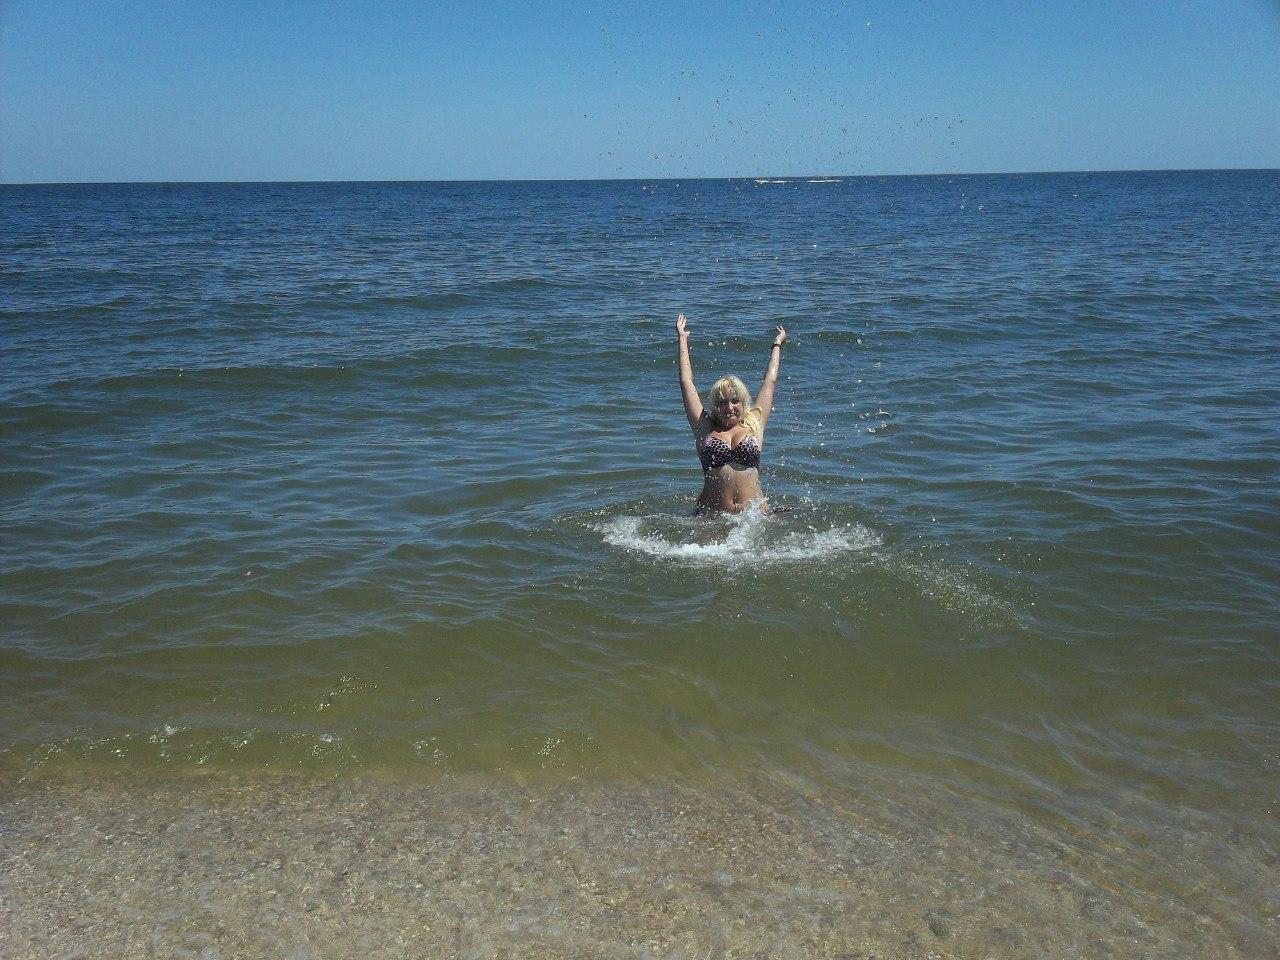 Азовское море. Бердянск. 2012 г. RhO7Ymx4R-4